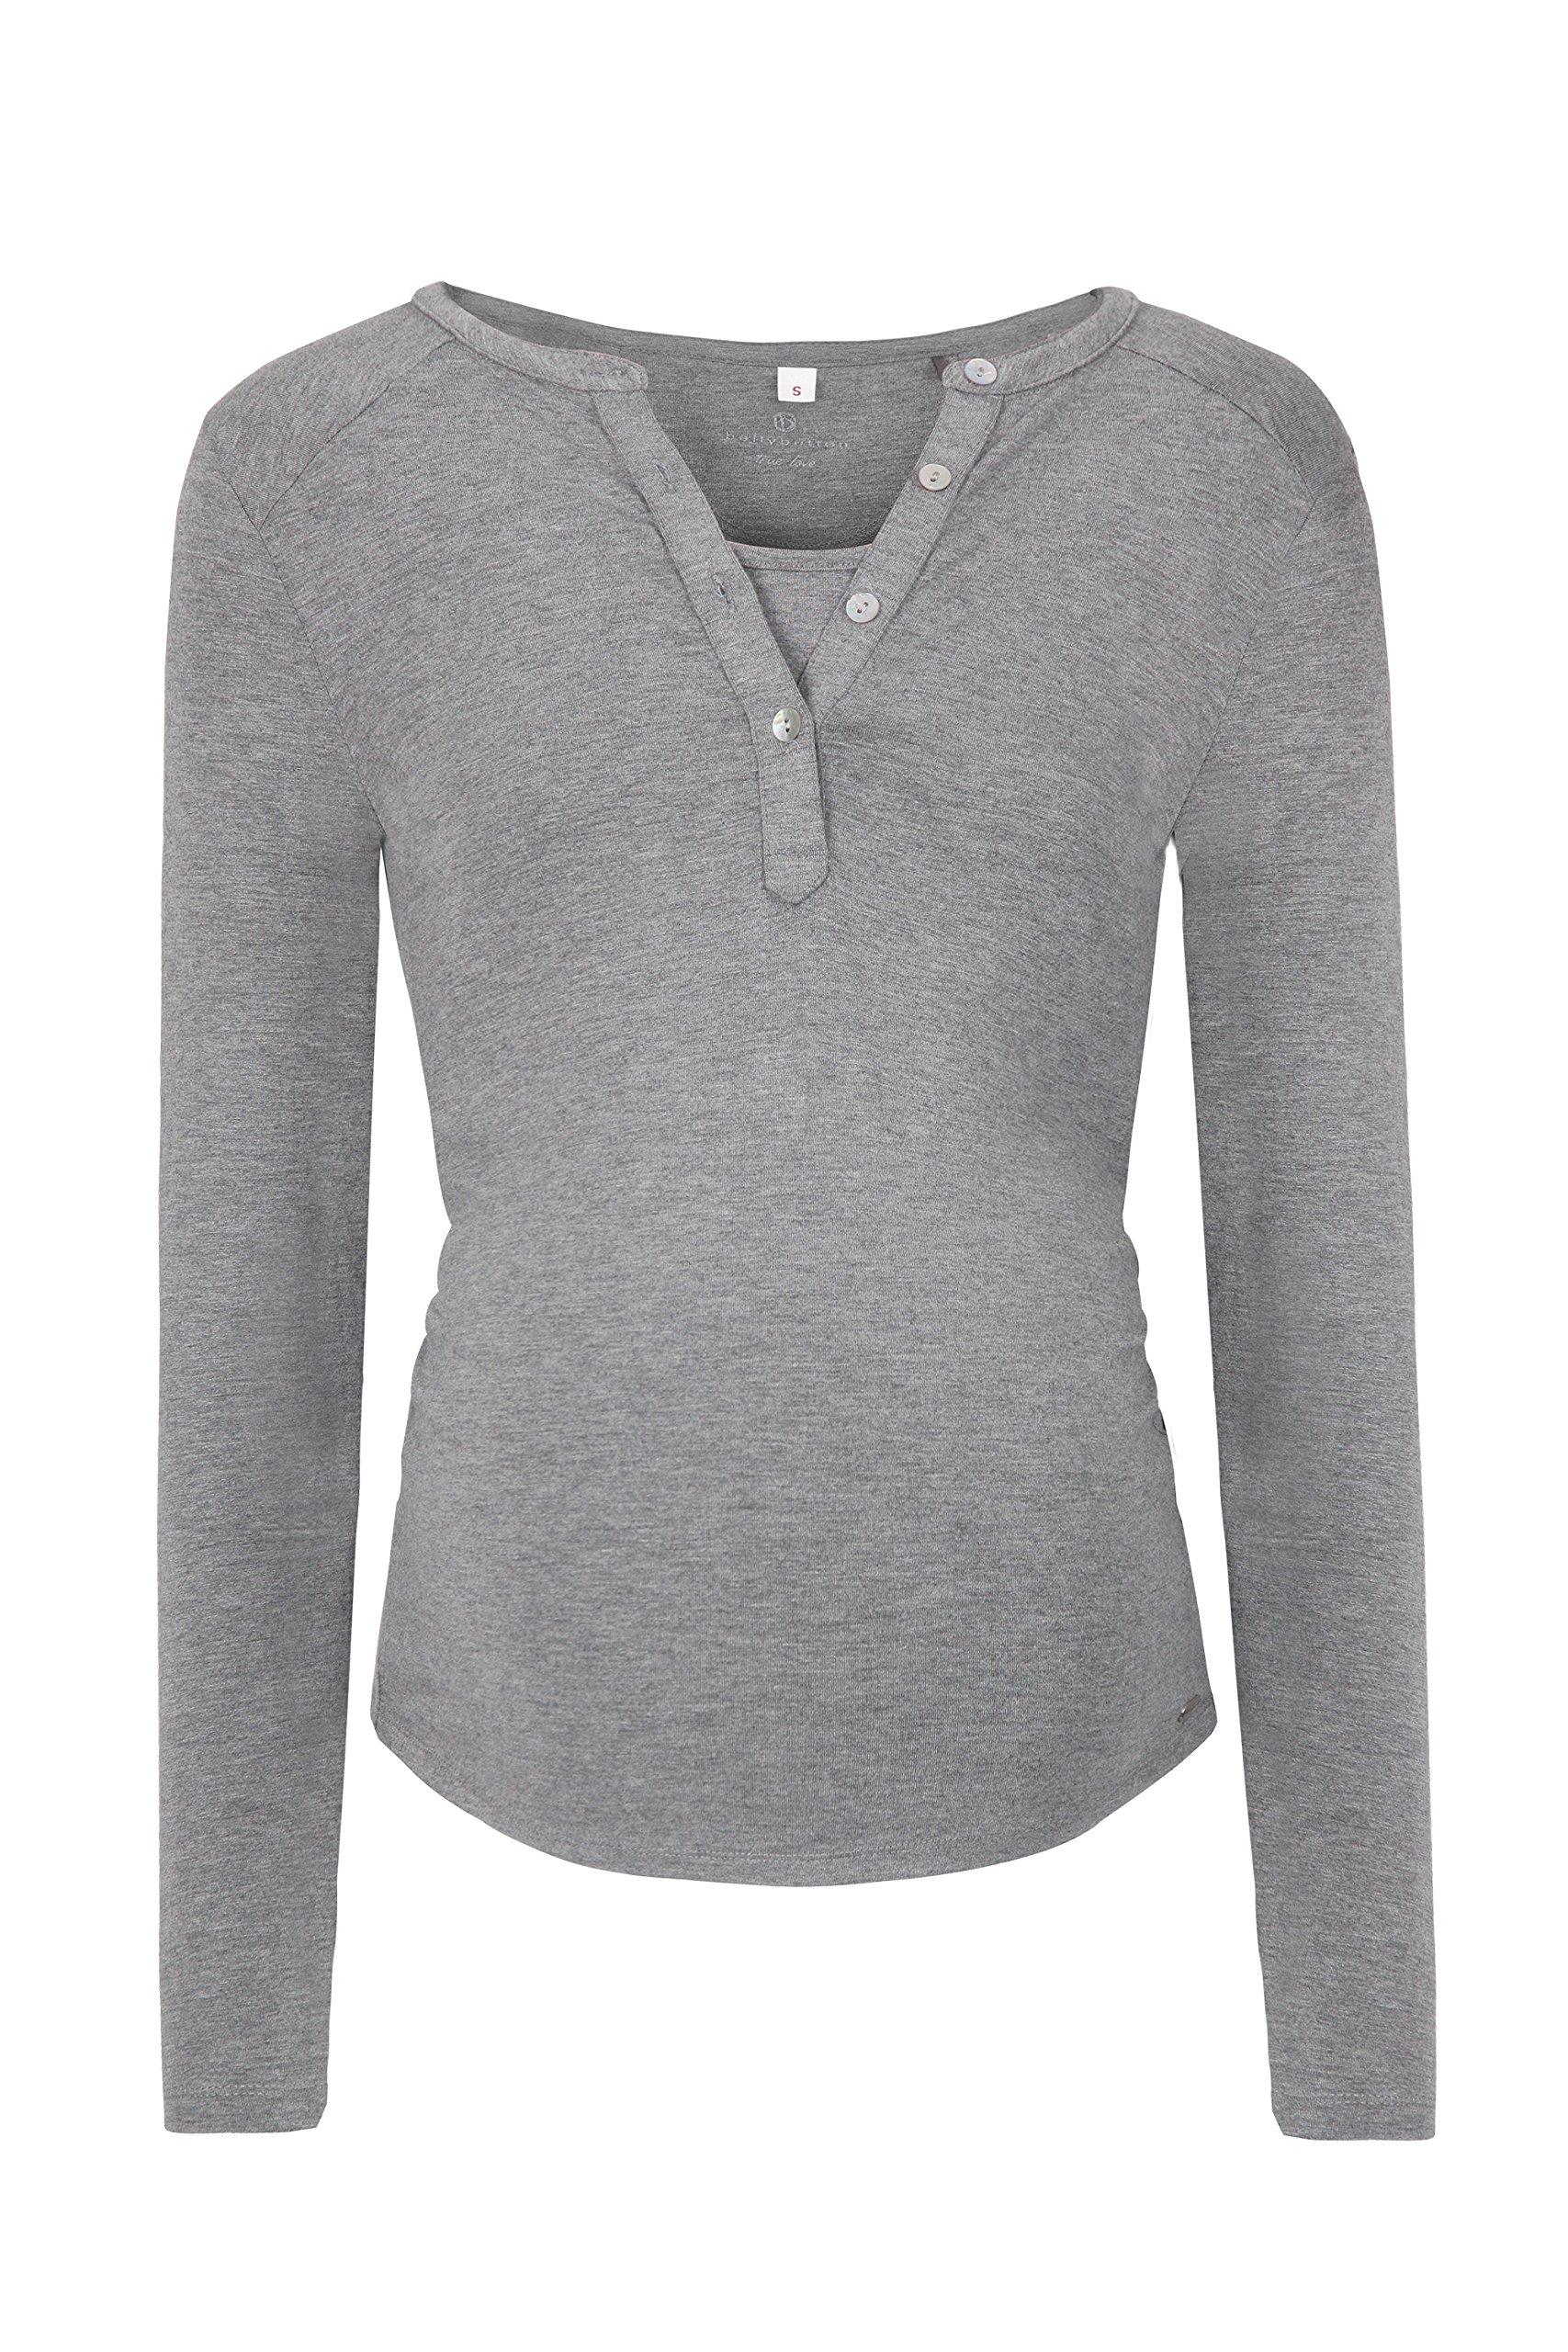 bellybutton Julia-Stillshirt 1/1 Arm, Maglie a Maniche Lunghe Premaman Donna, Grau (Middle 8500), 4